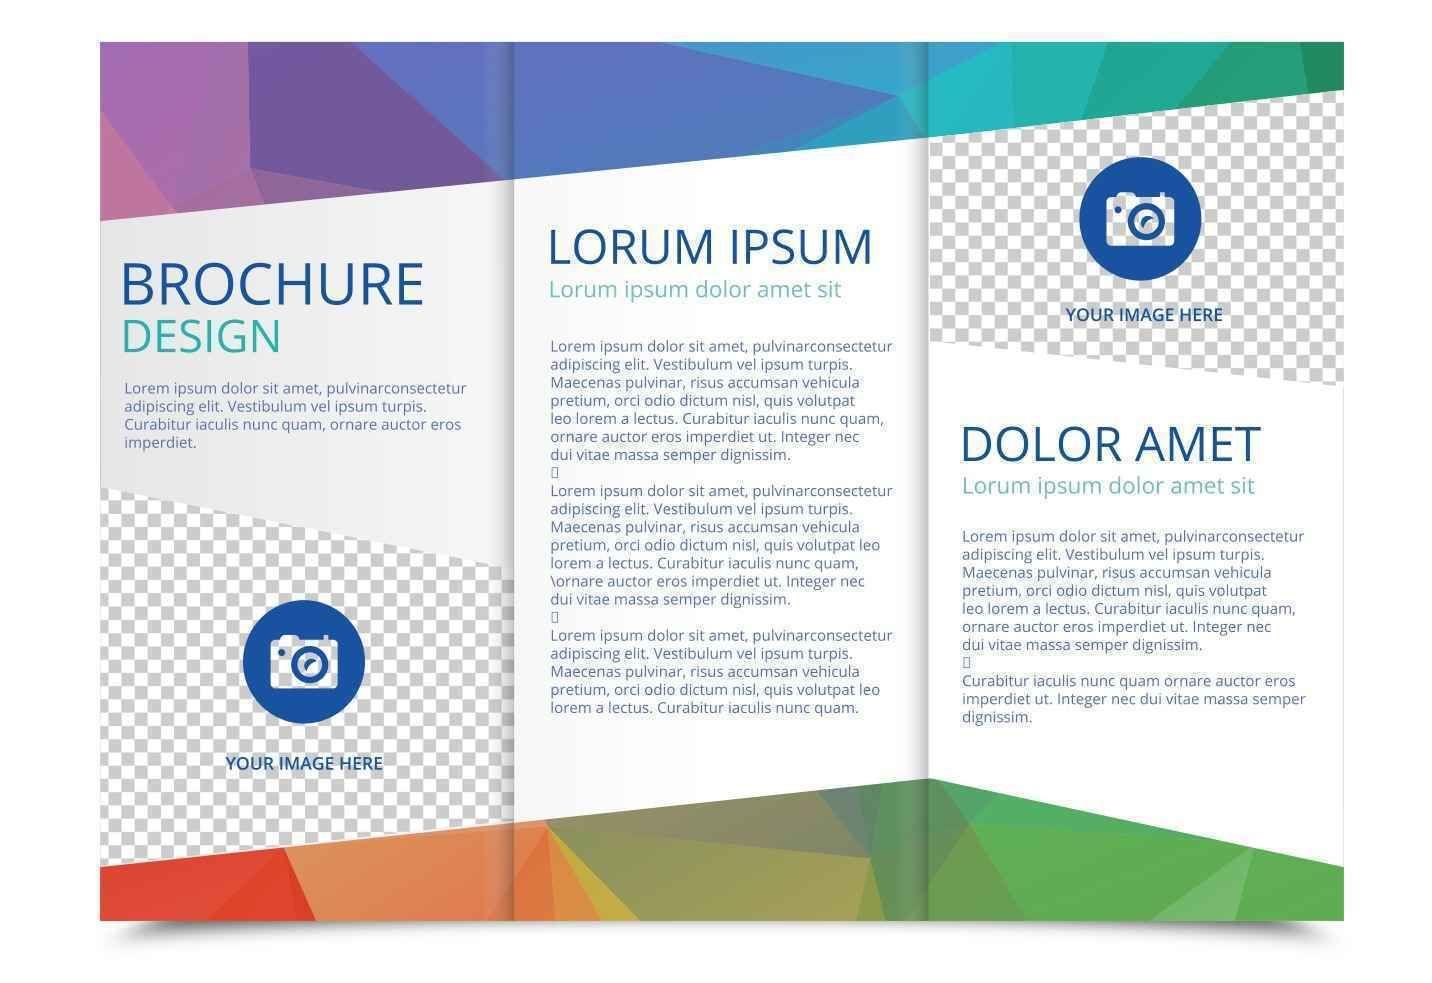 027 Template Ideas Brochure Templates Word Free Tri Fold Inside Free Tri Fold Brochure Templates Micr Trifold Brochure Brochure Template Free Brochure Template